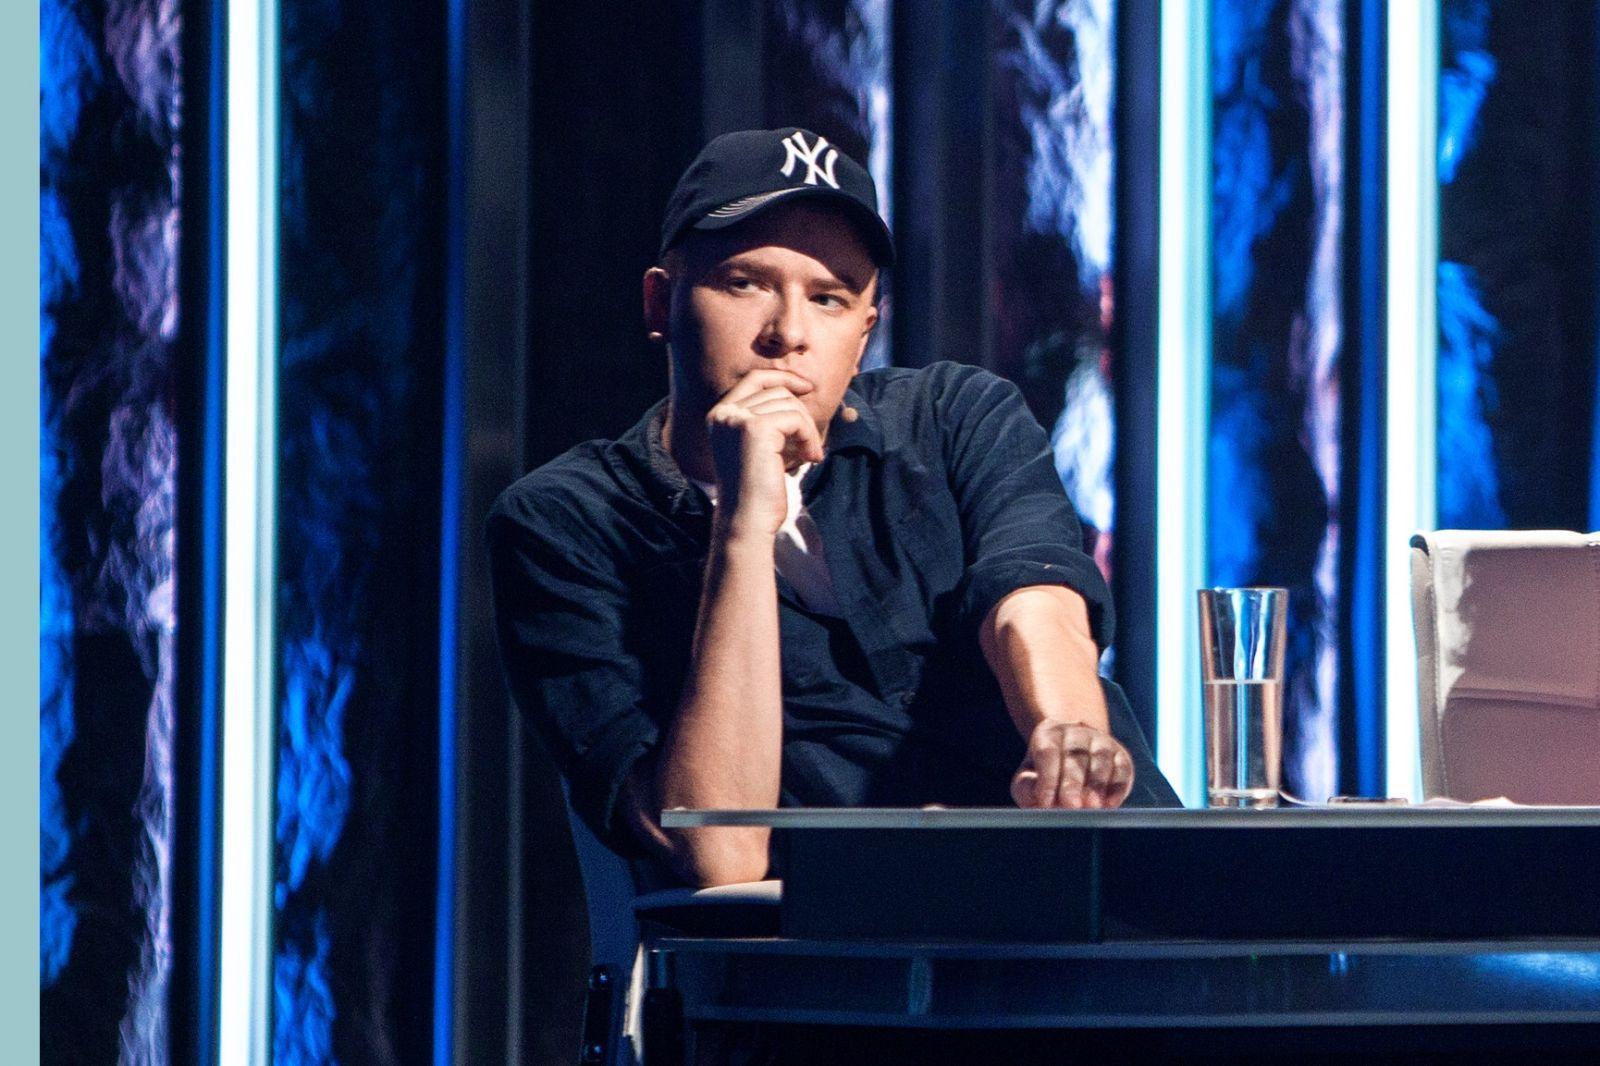 Андрей Данилко вошел в жюри нацотбора Евровидение 2018